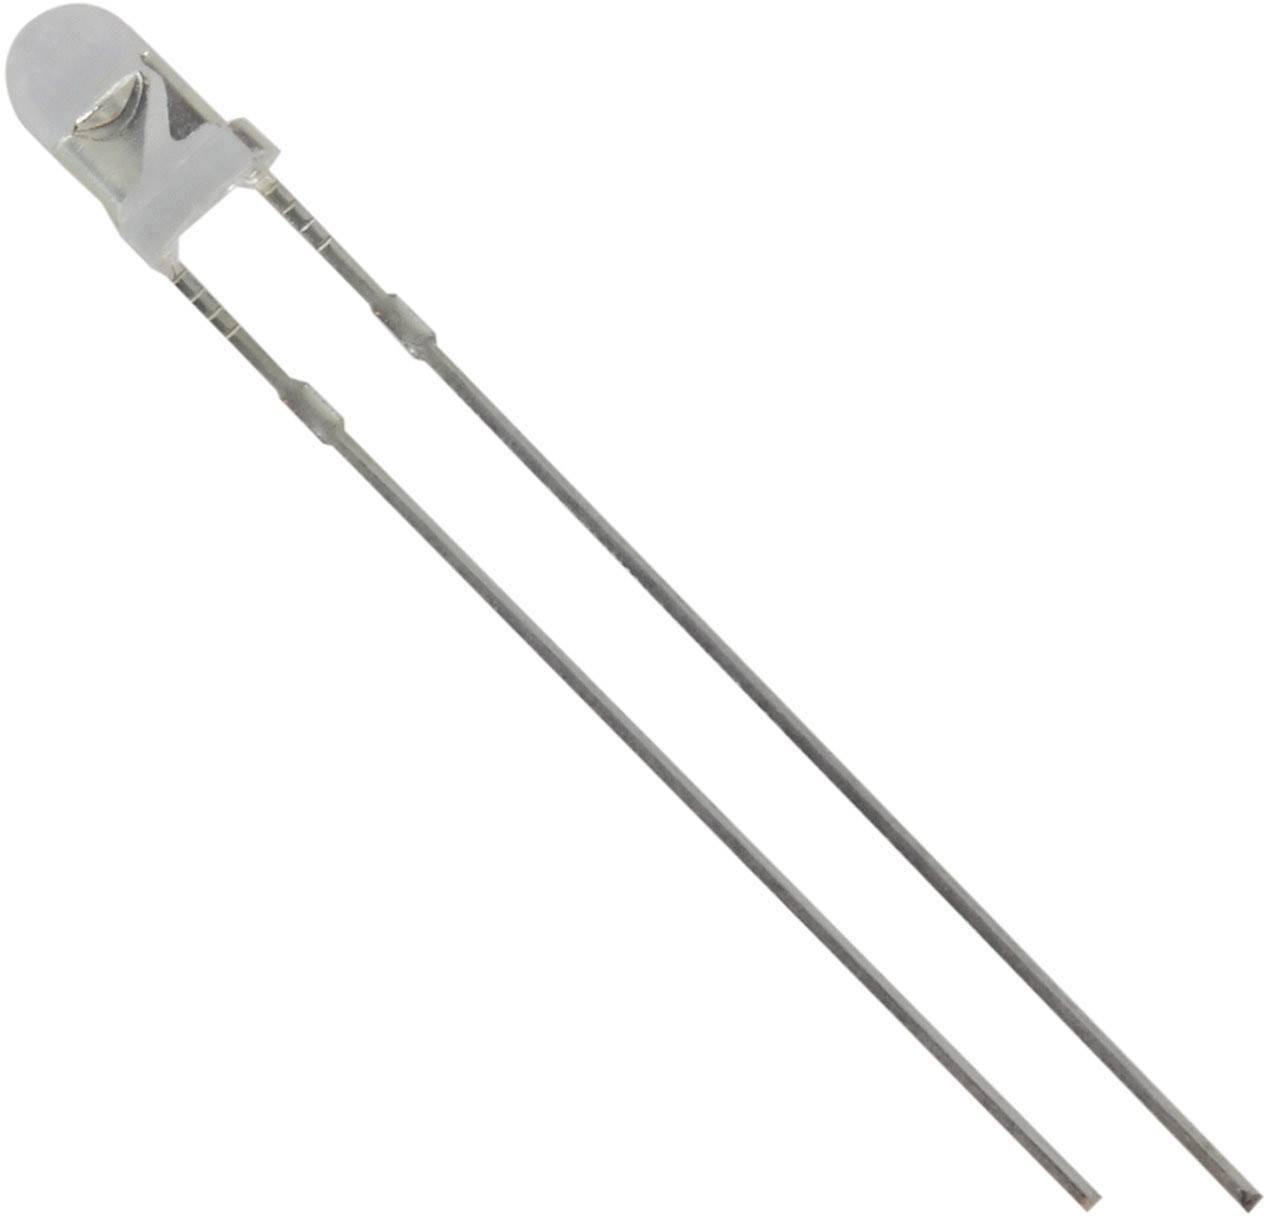 LED s vývody HuiYuan 3034R1C-CSC-C, typ čočky kulatý, 3 mm, 25 °, 20 mA, 3700 mcd, 2.1 V, červená